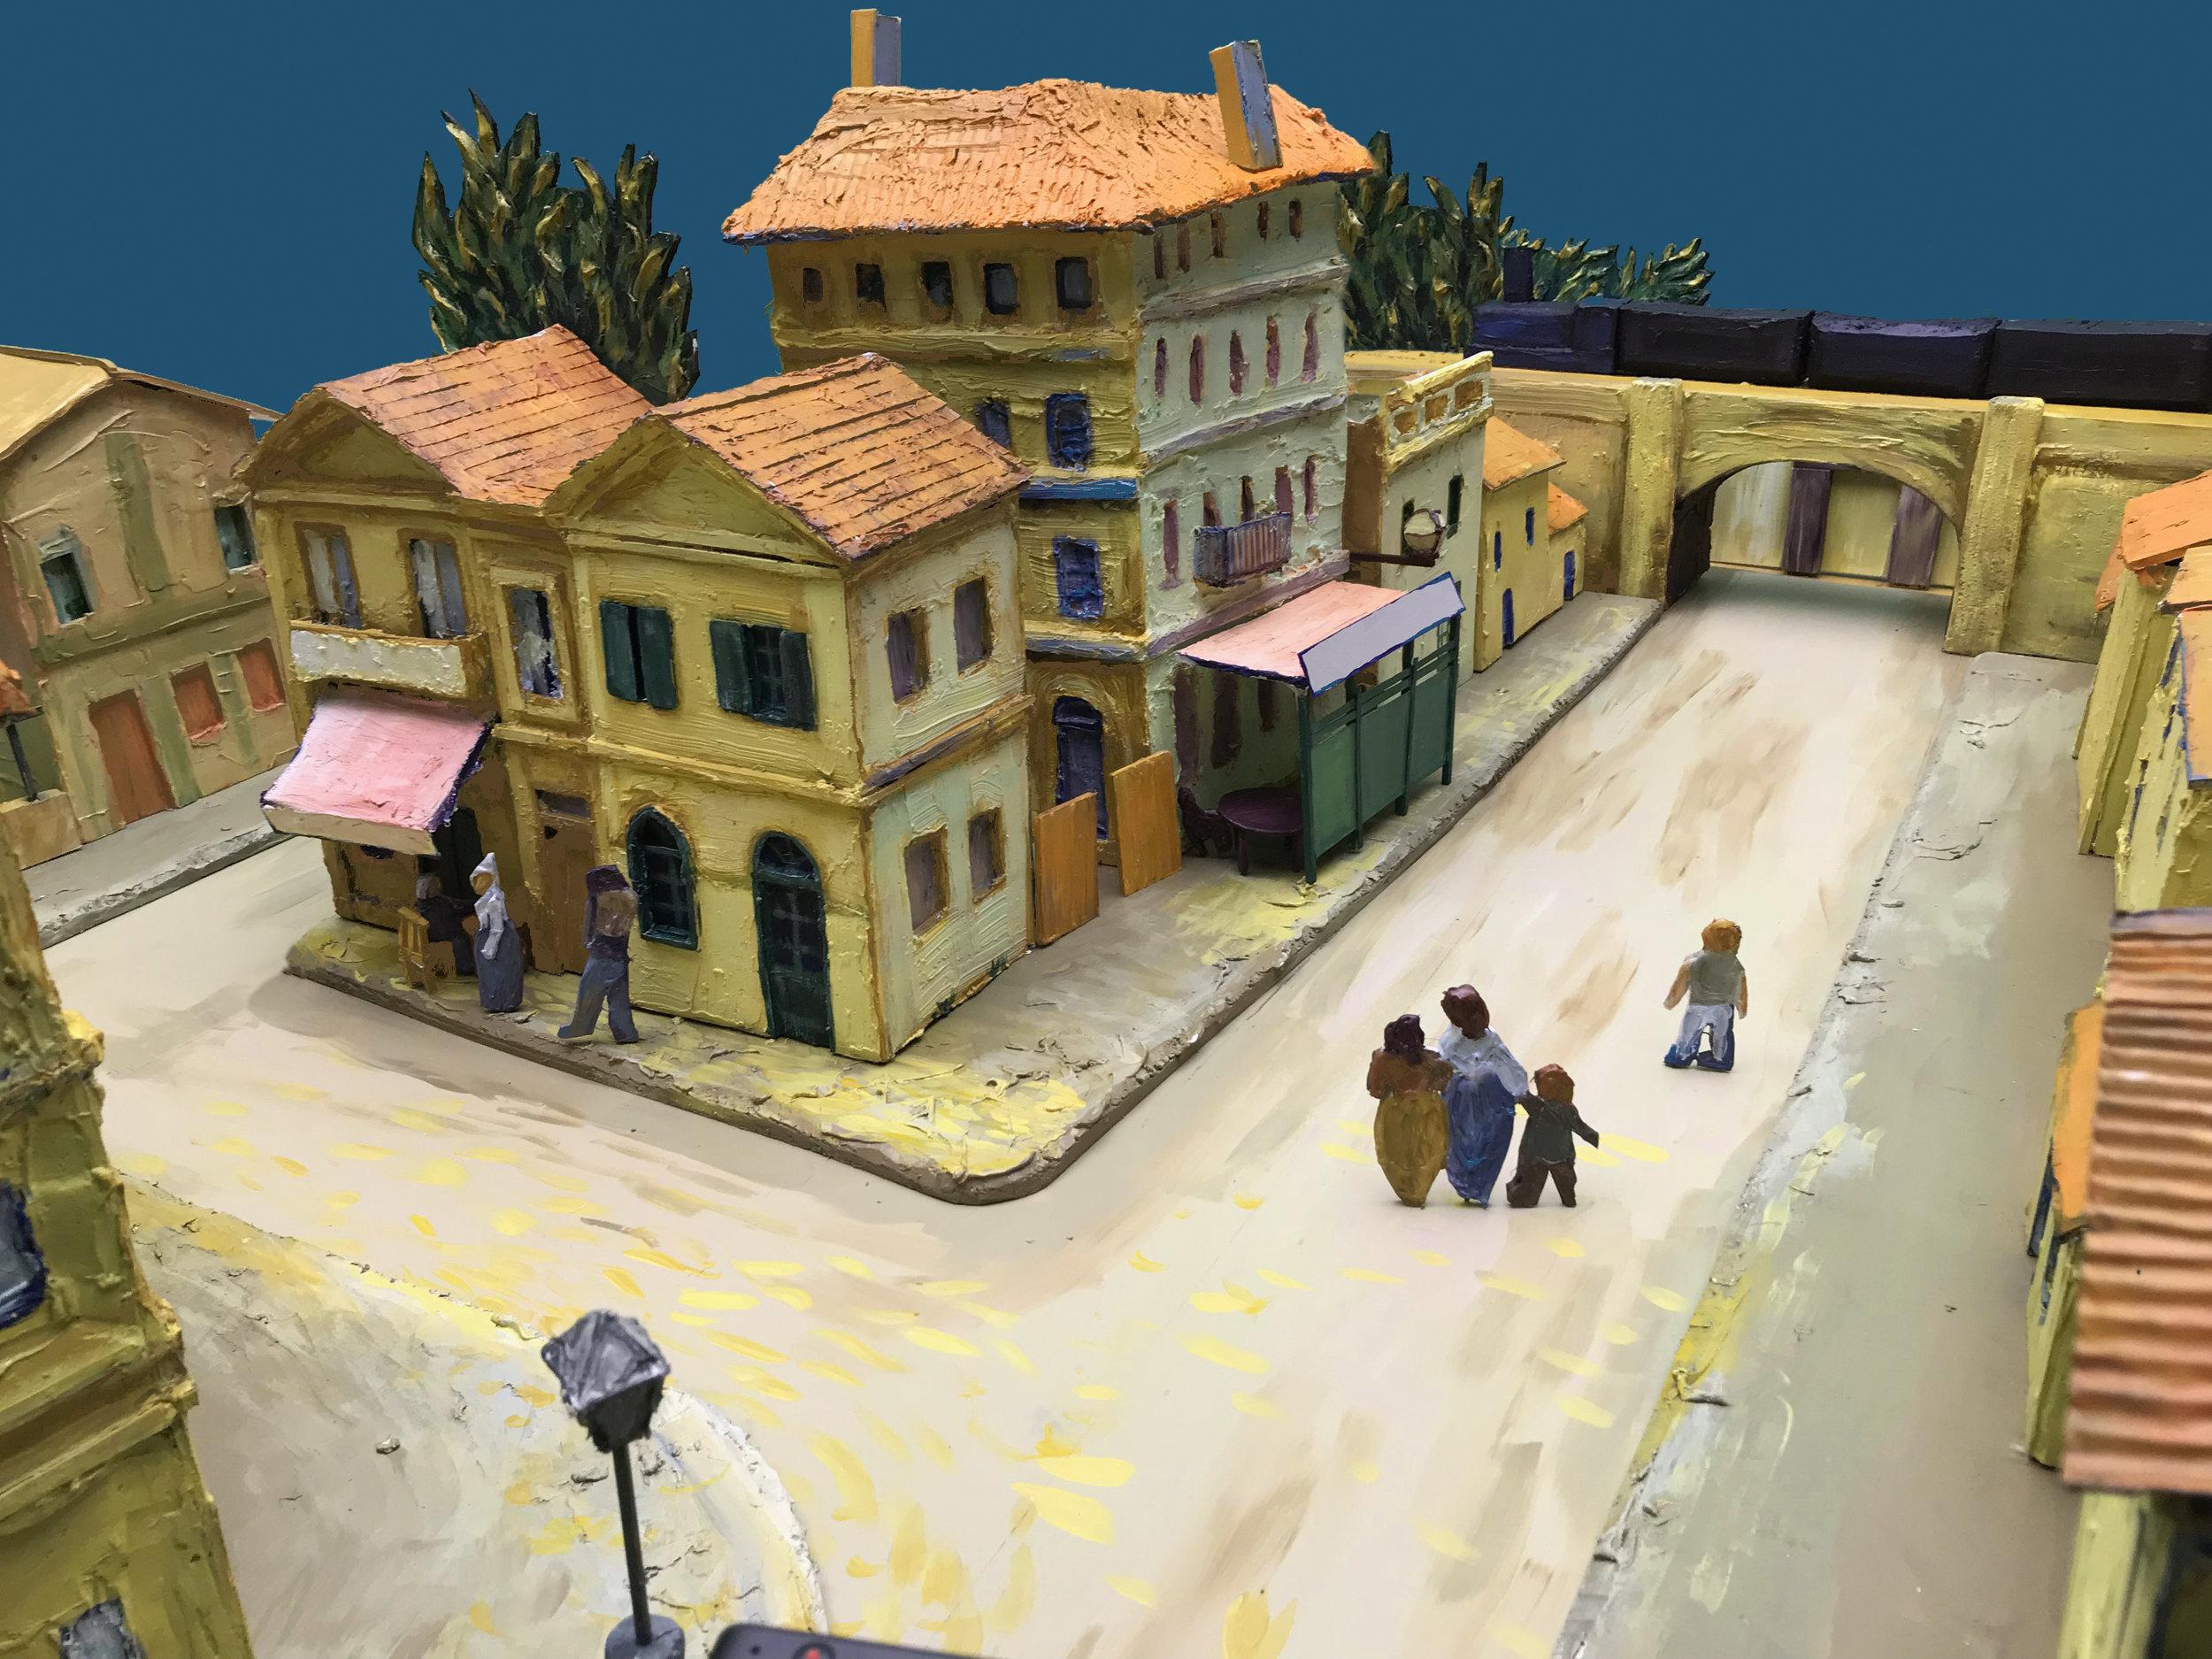 Diorama for The Van Gogh Museum Amsterdam